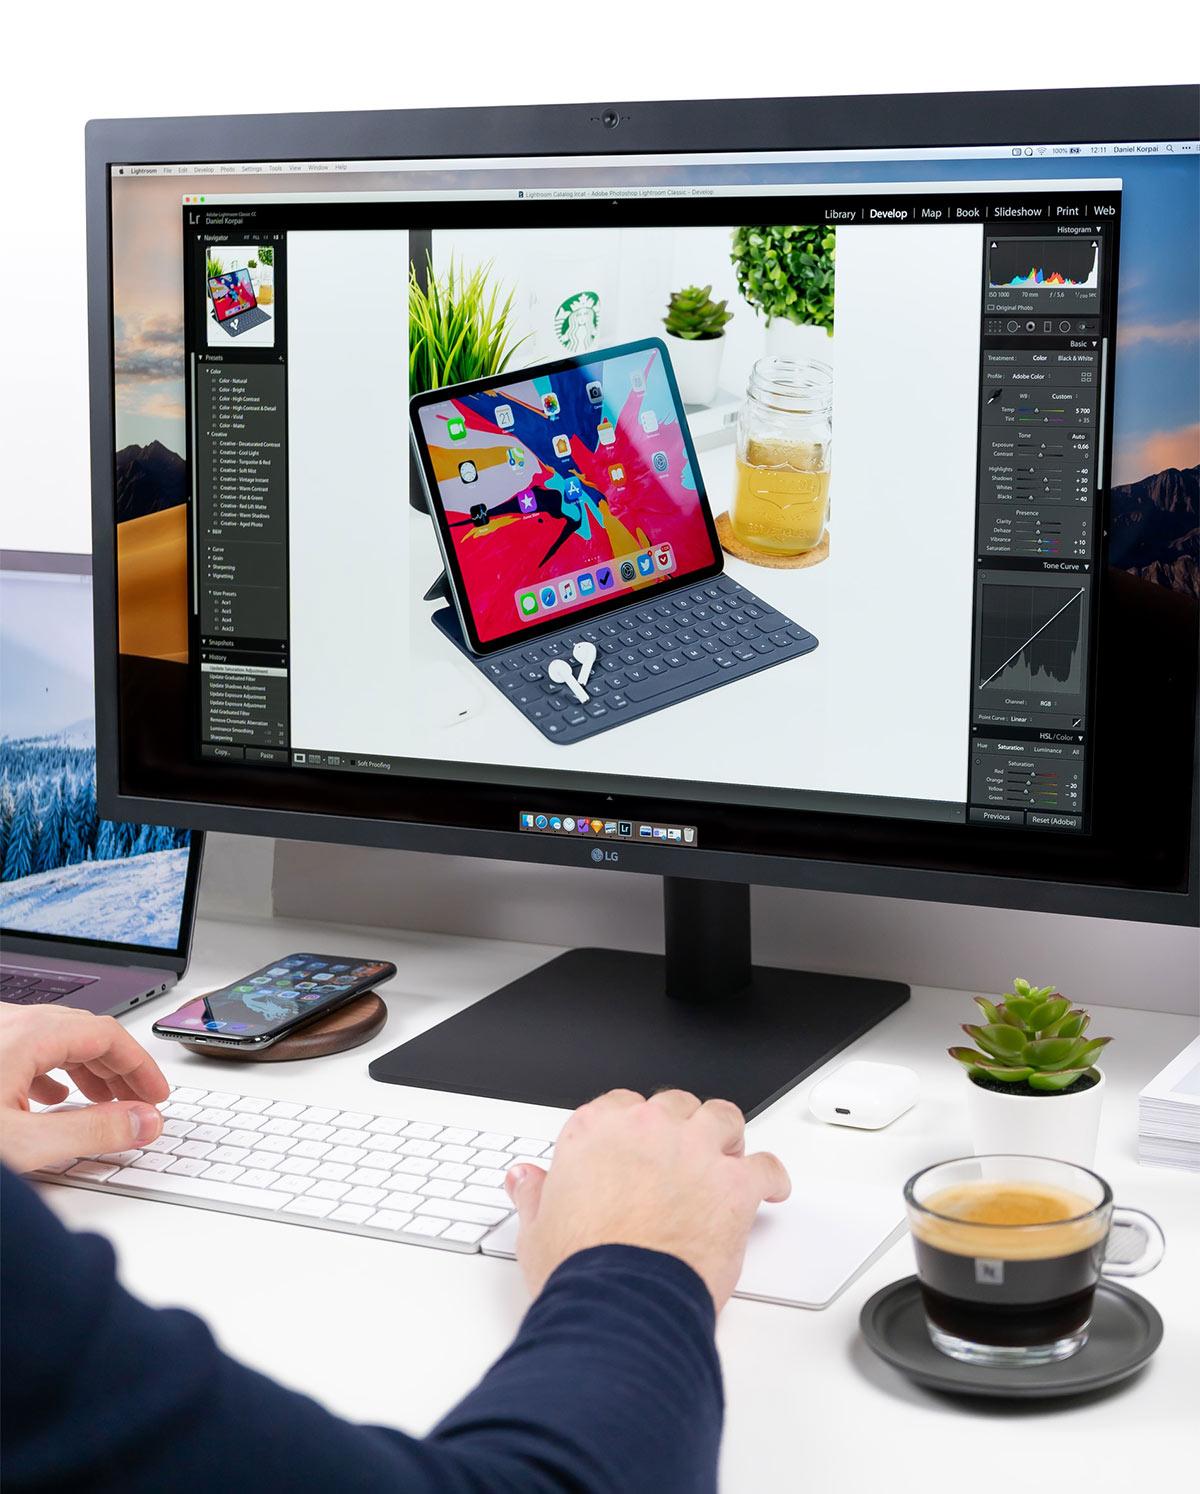 Person editing photo on Adobe Lightroom on desktop | Photo: Danoel Korpai via Unsplash